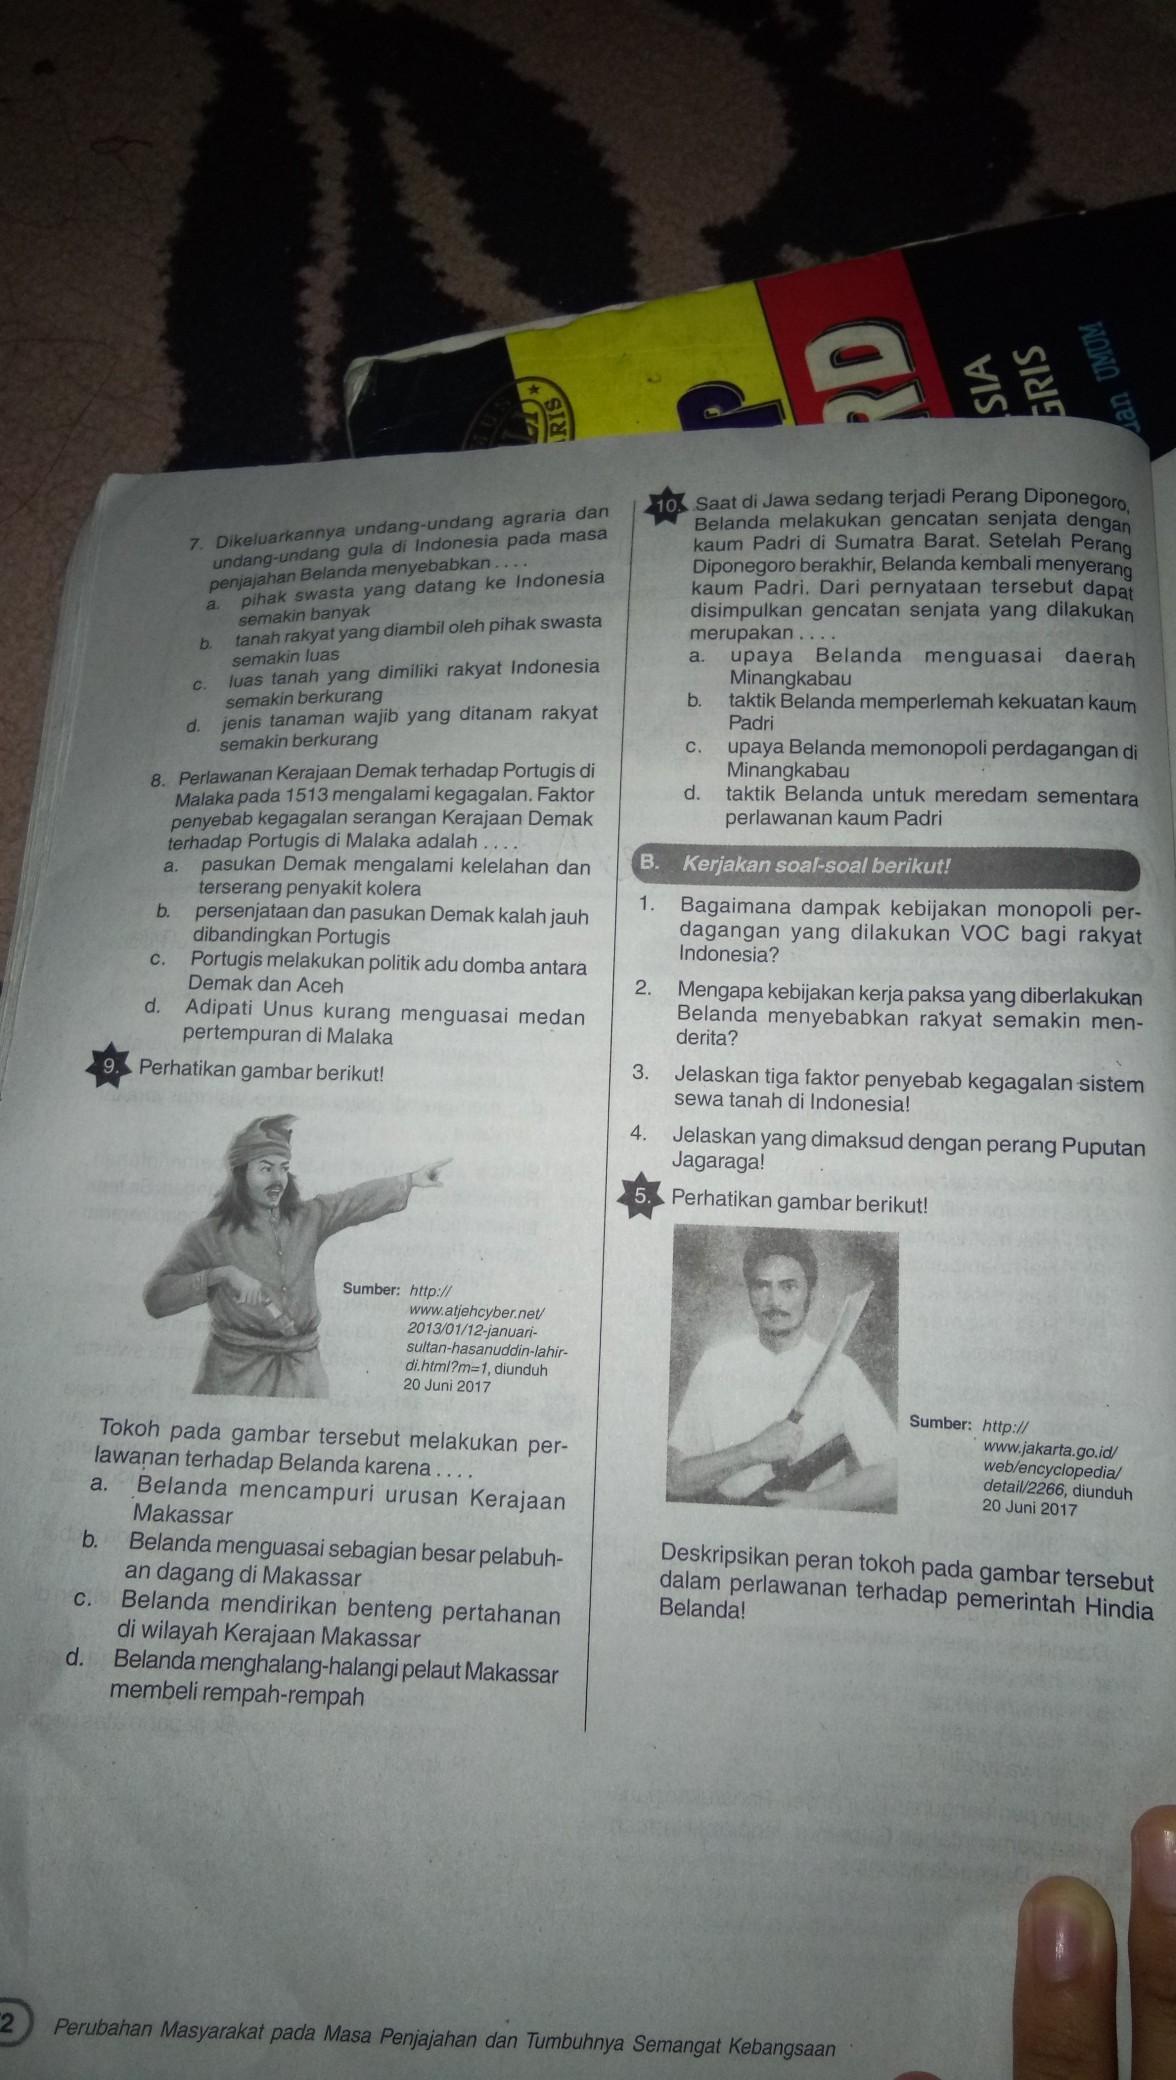 Kunci Jawaban Lks Bahasa Inggris Kelas 9 Semester 1 Dunia Sekolah